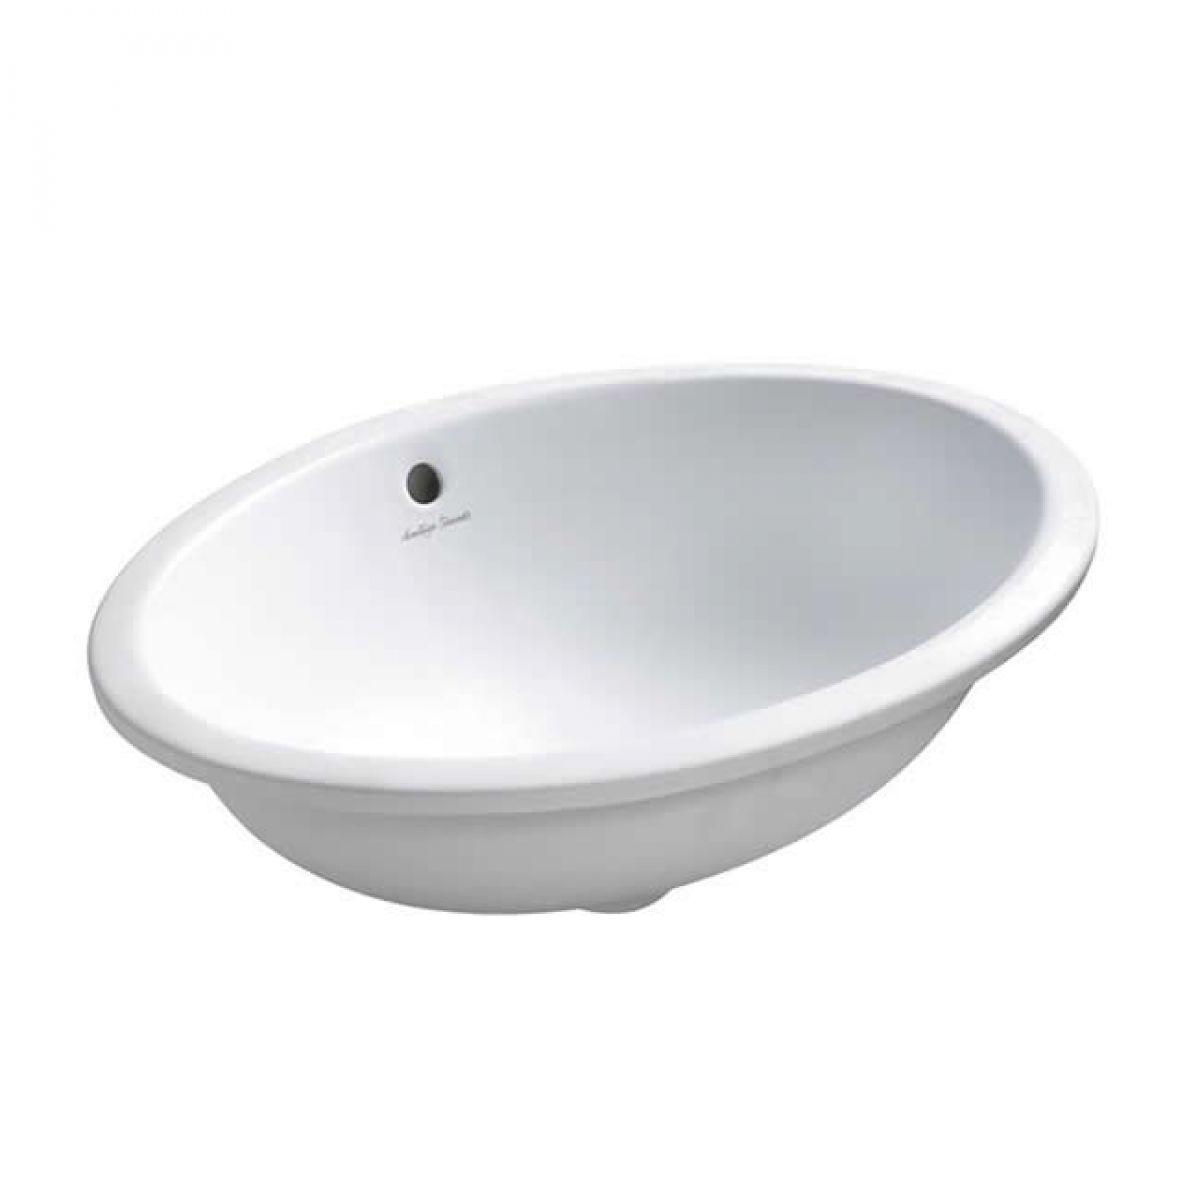 Armitage shanks bathroom sinks - Armitage Shanks Marlow Under Countertop Basin